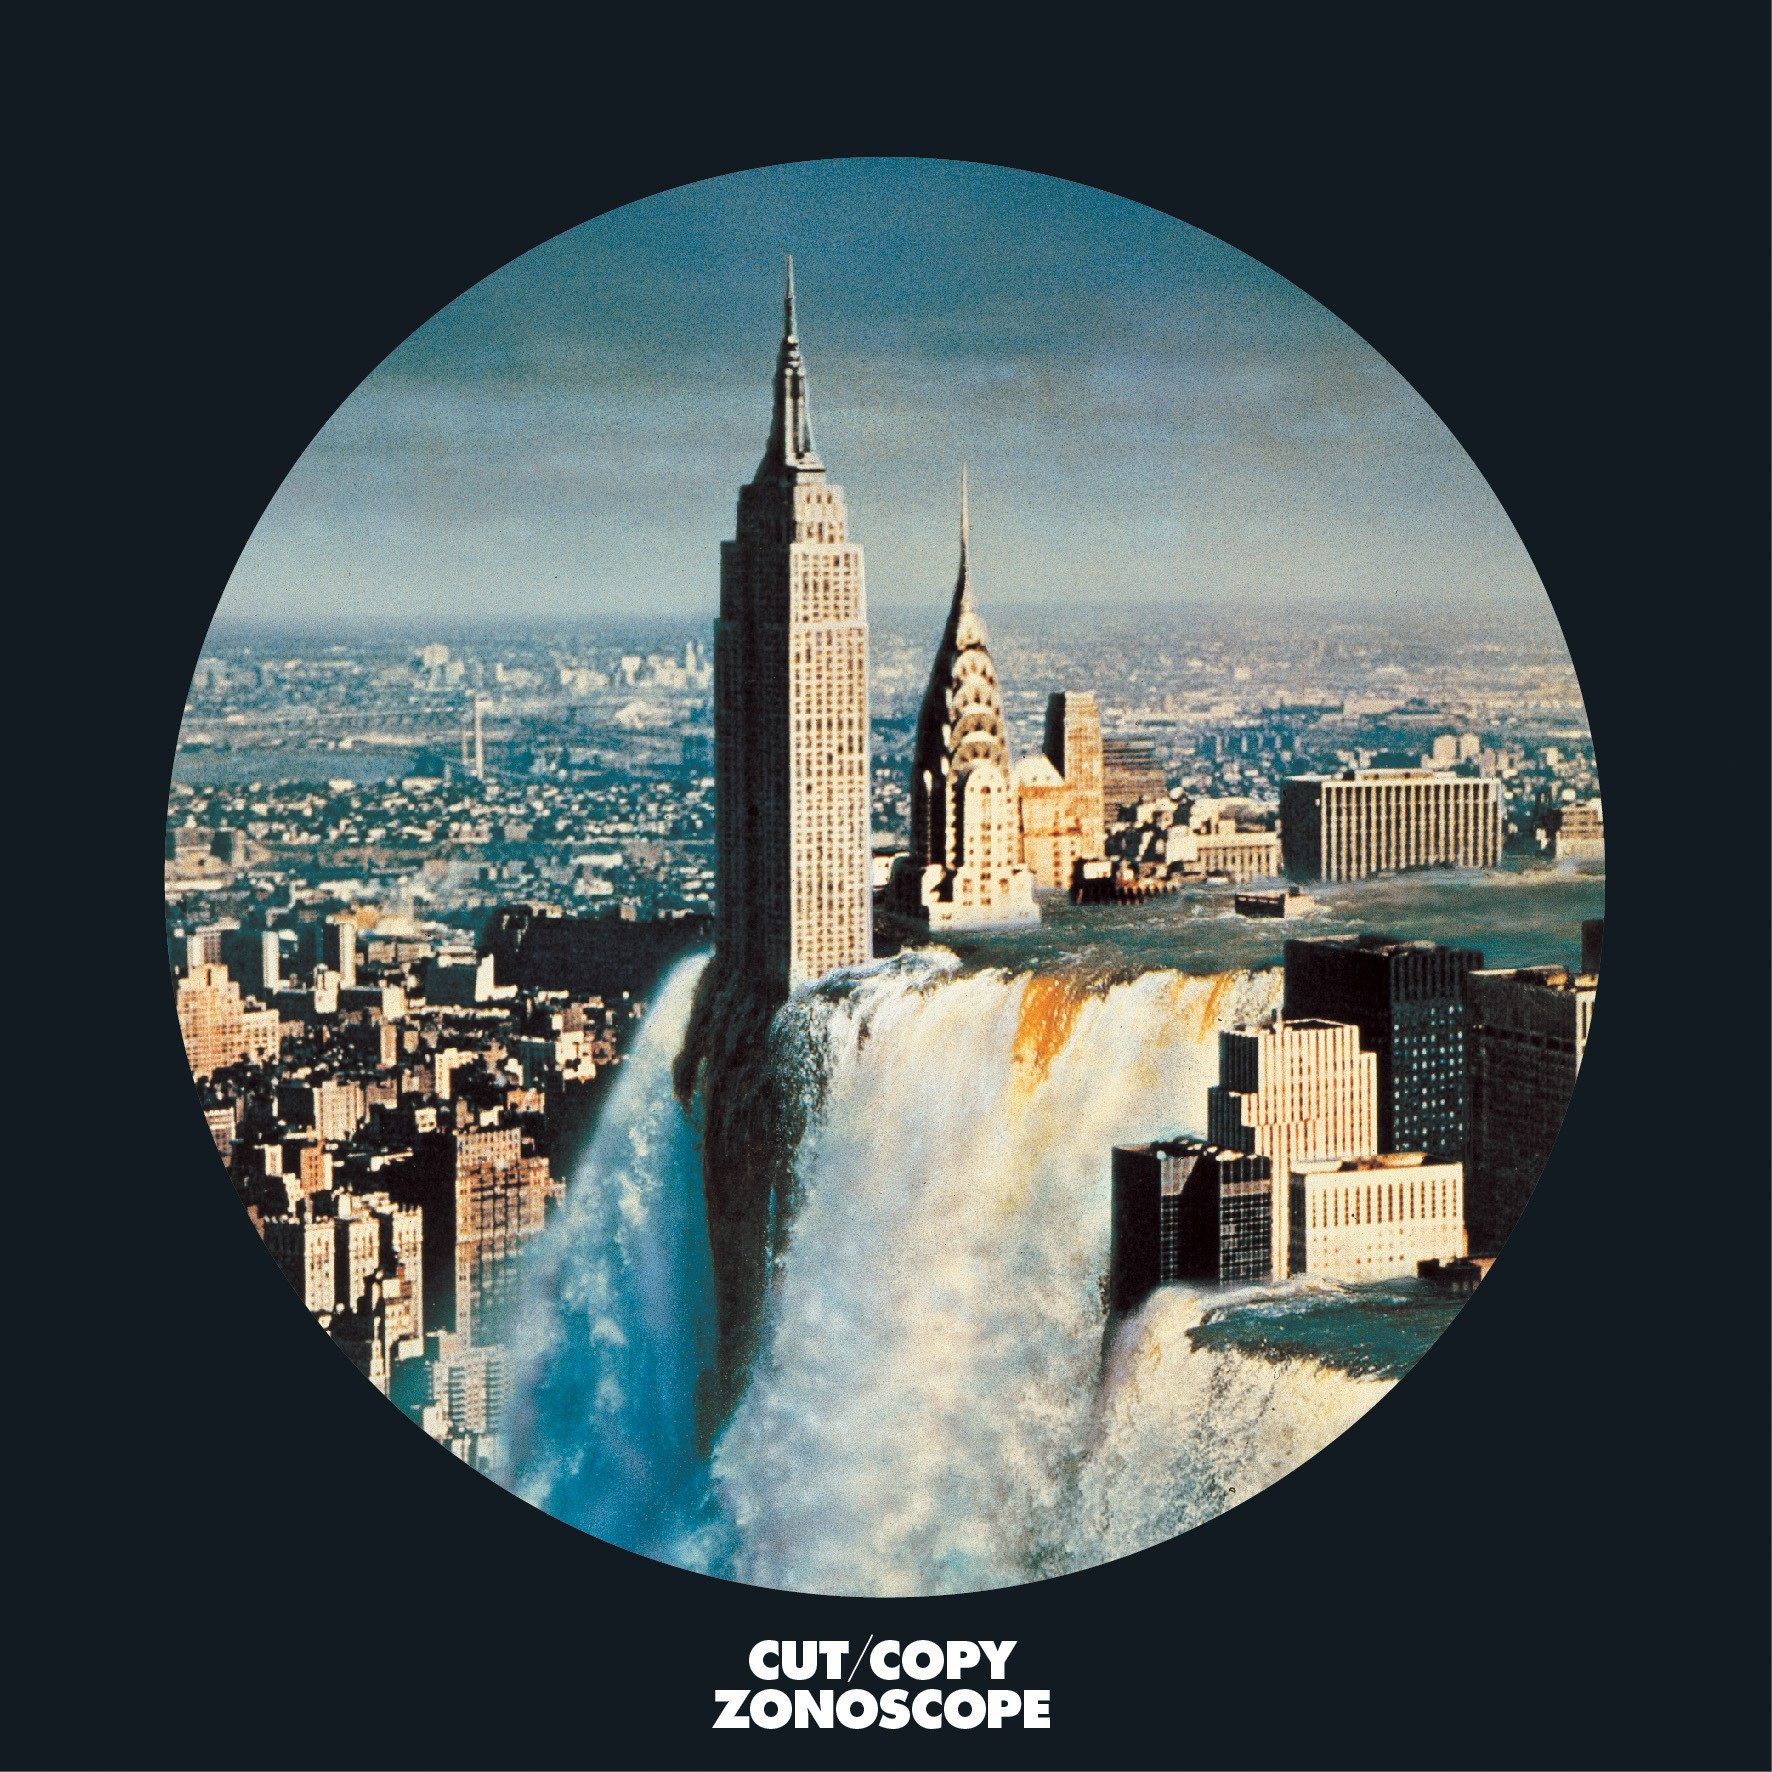 CC-ZONOSCOPE-COV-LORES